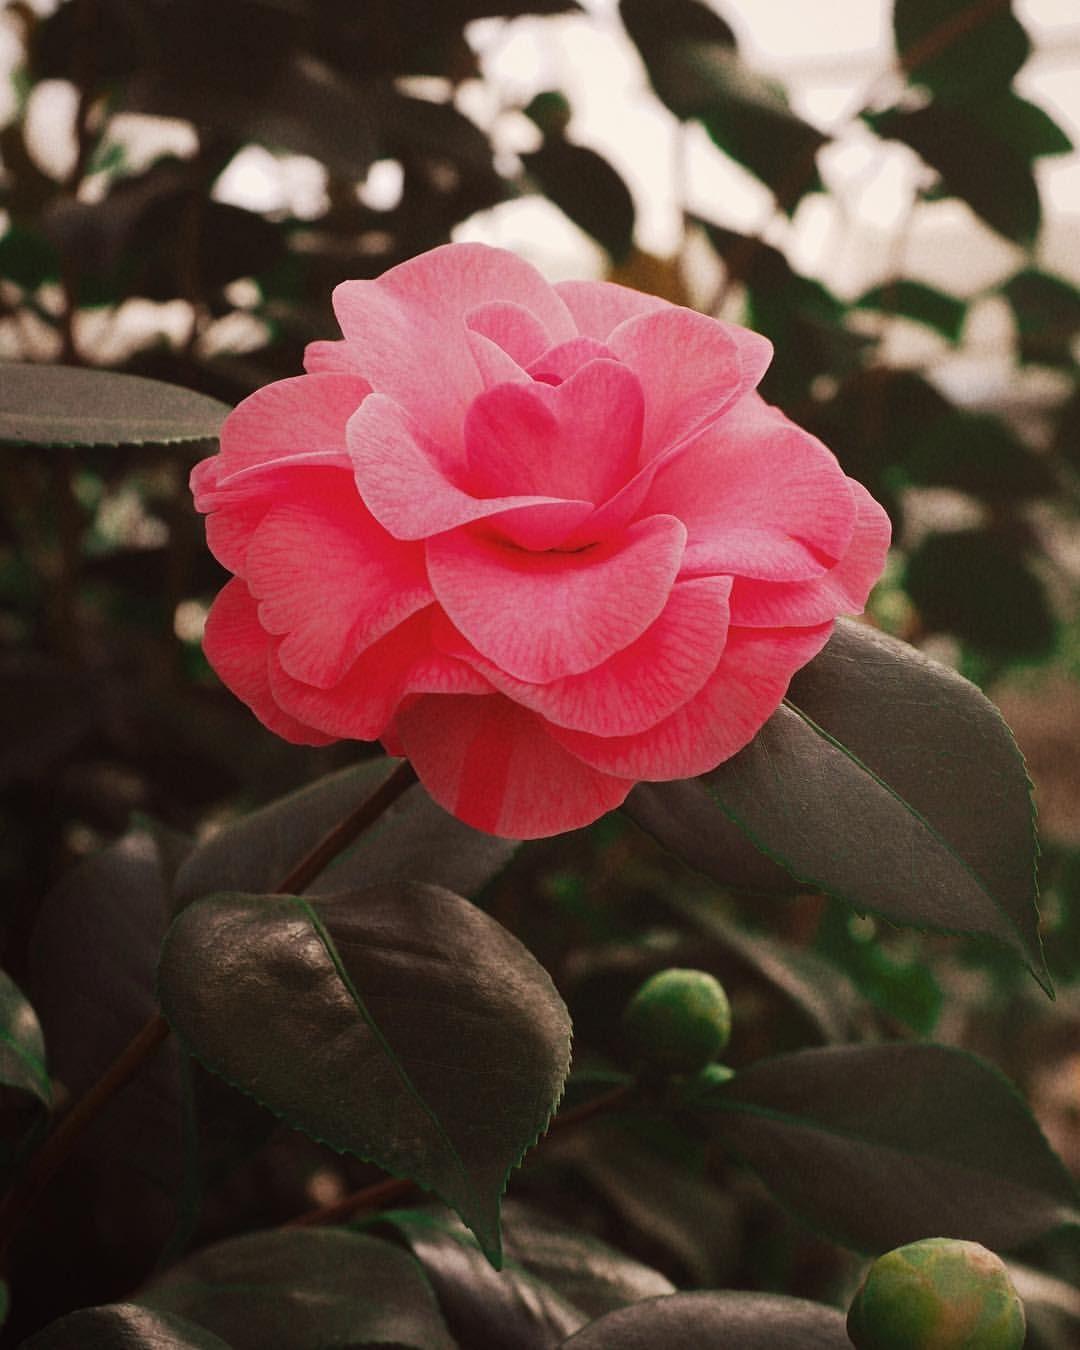 Flower Photography Pink Flower Photography Flowers Instagram